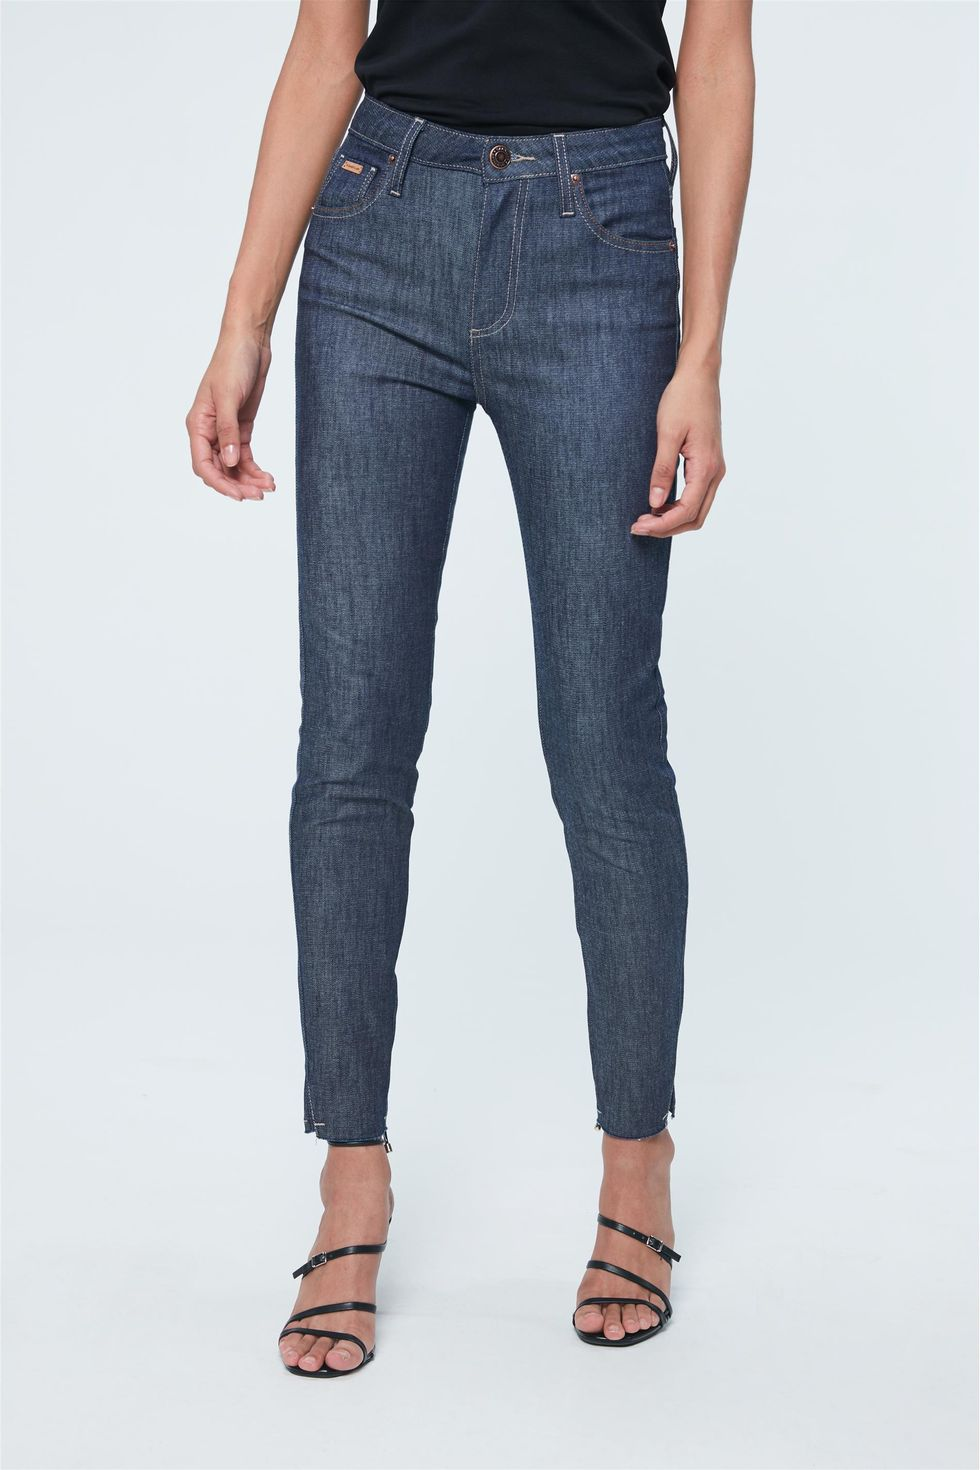 Calca-Jeans-Jegging-Cropped-Ecodamyller-Frente--